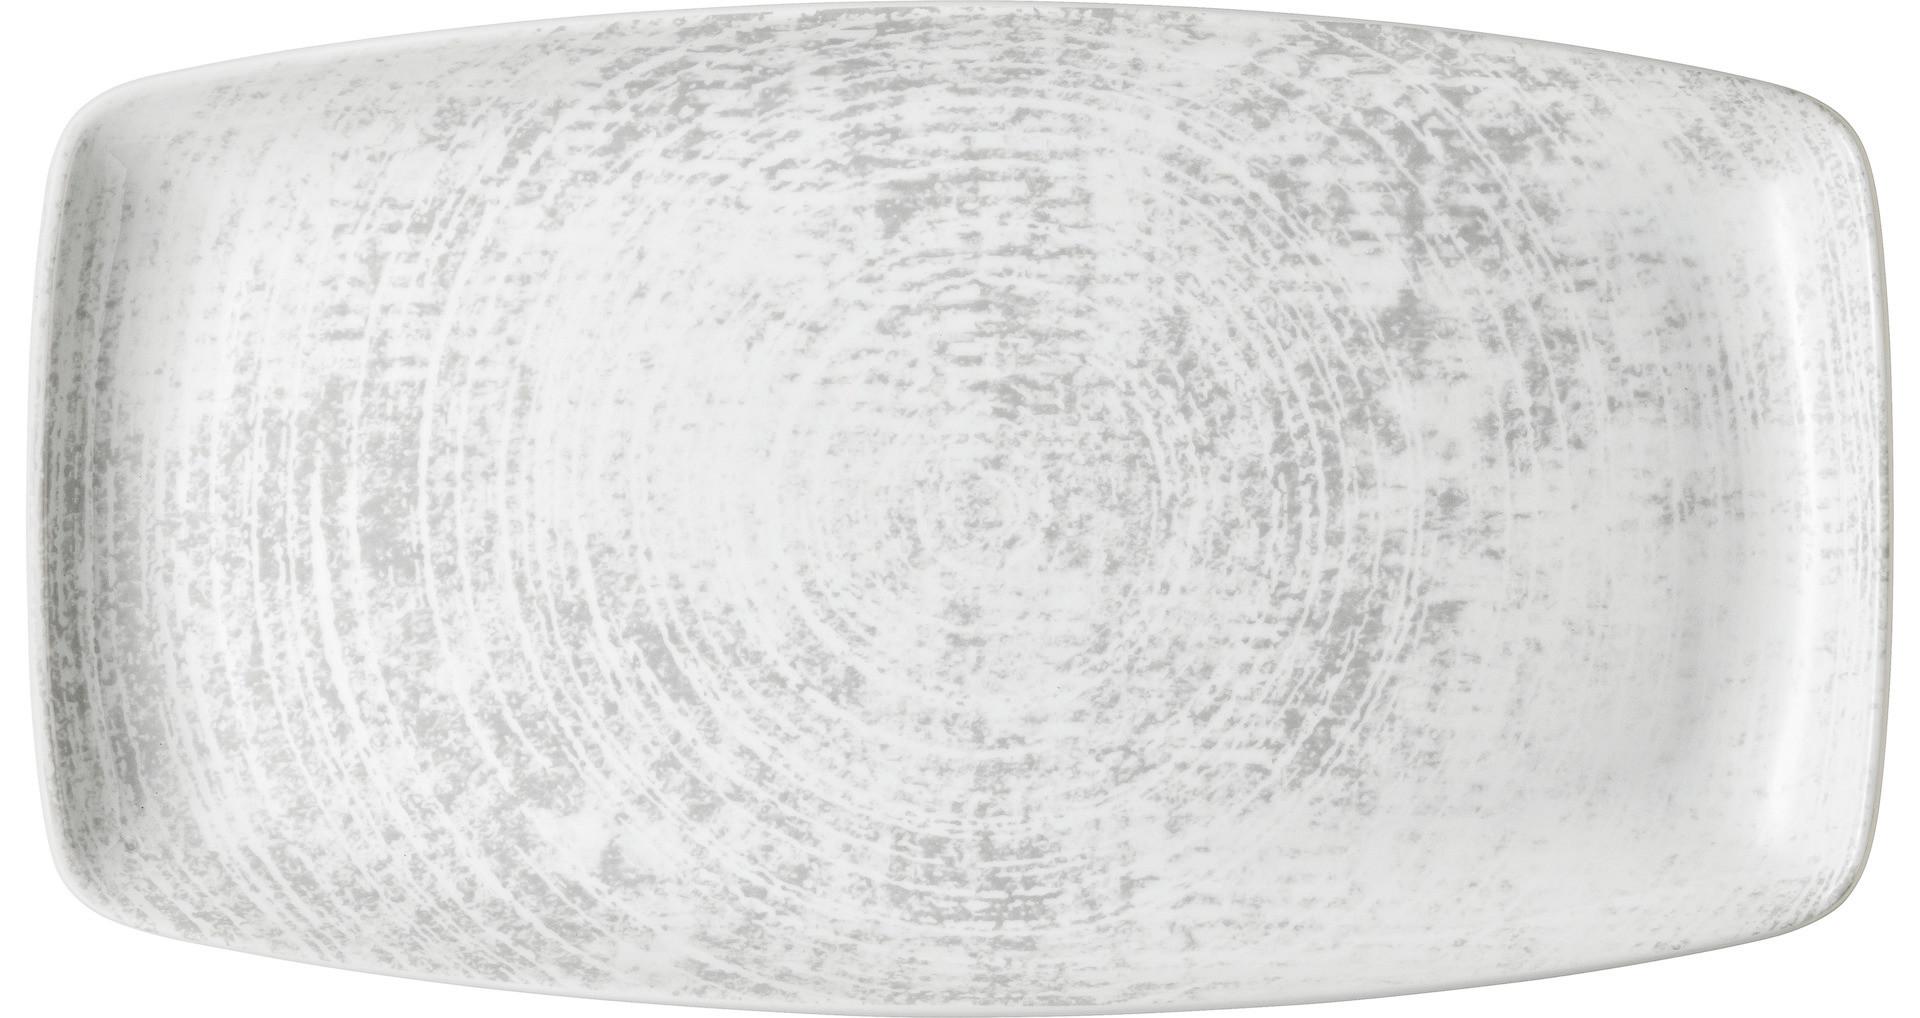 Shabby Chic, Burgerplatte 362 x 199 mm Dekor 1